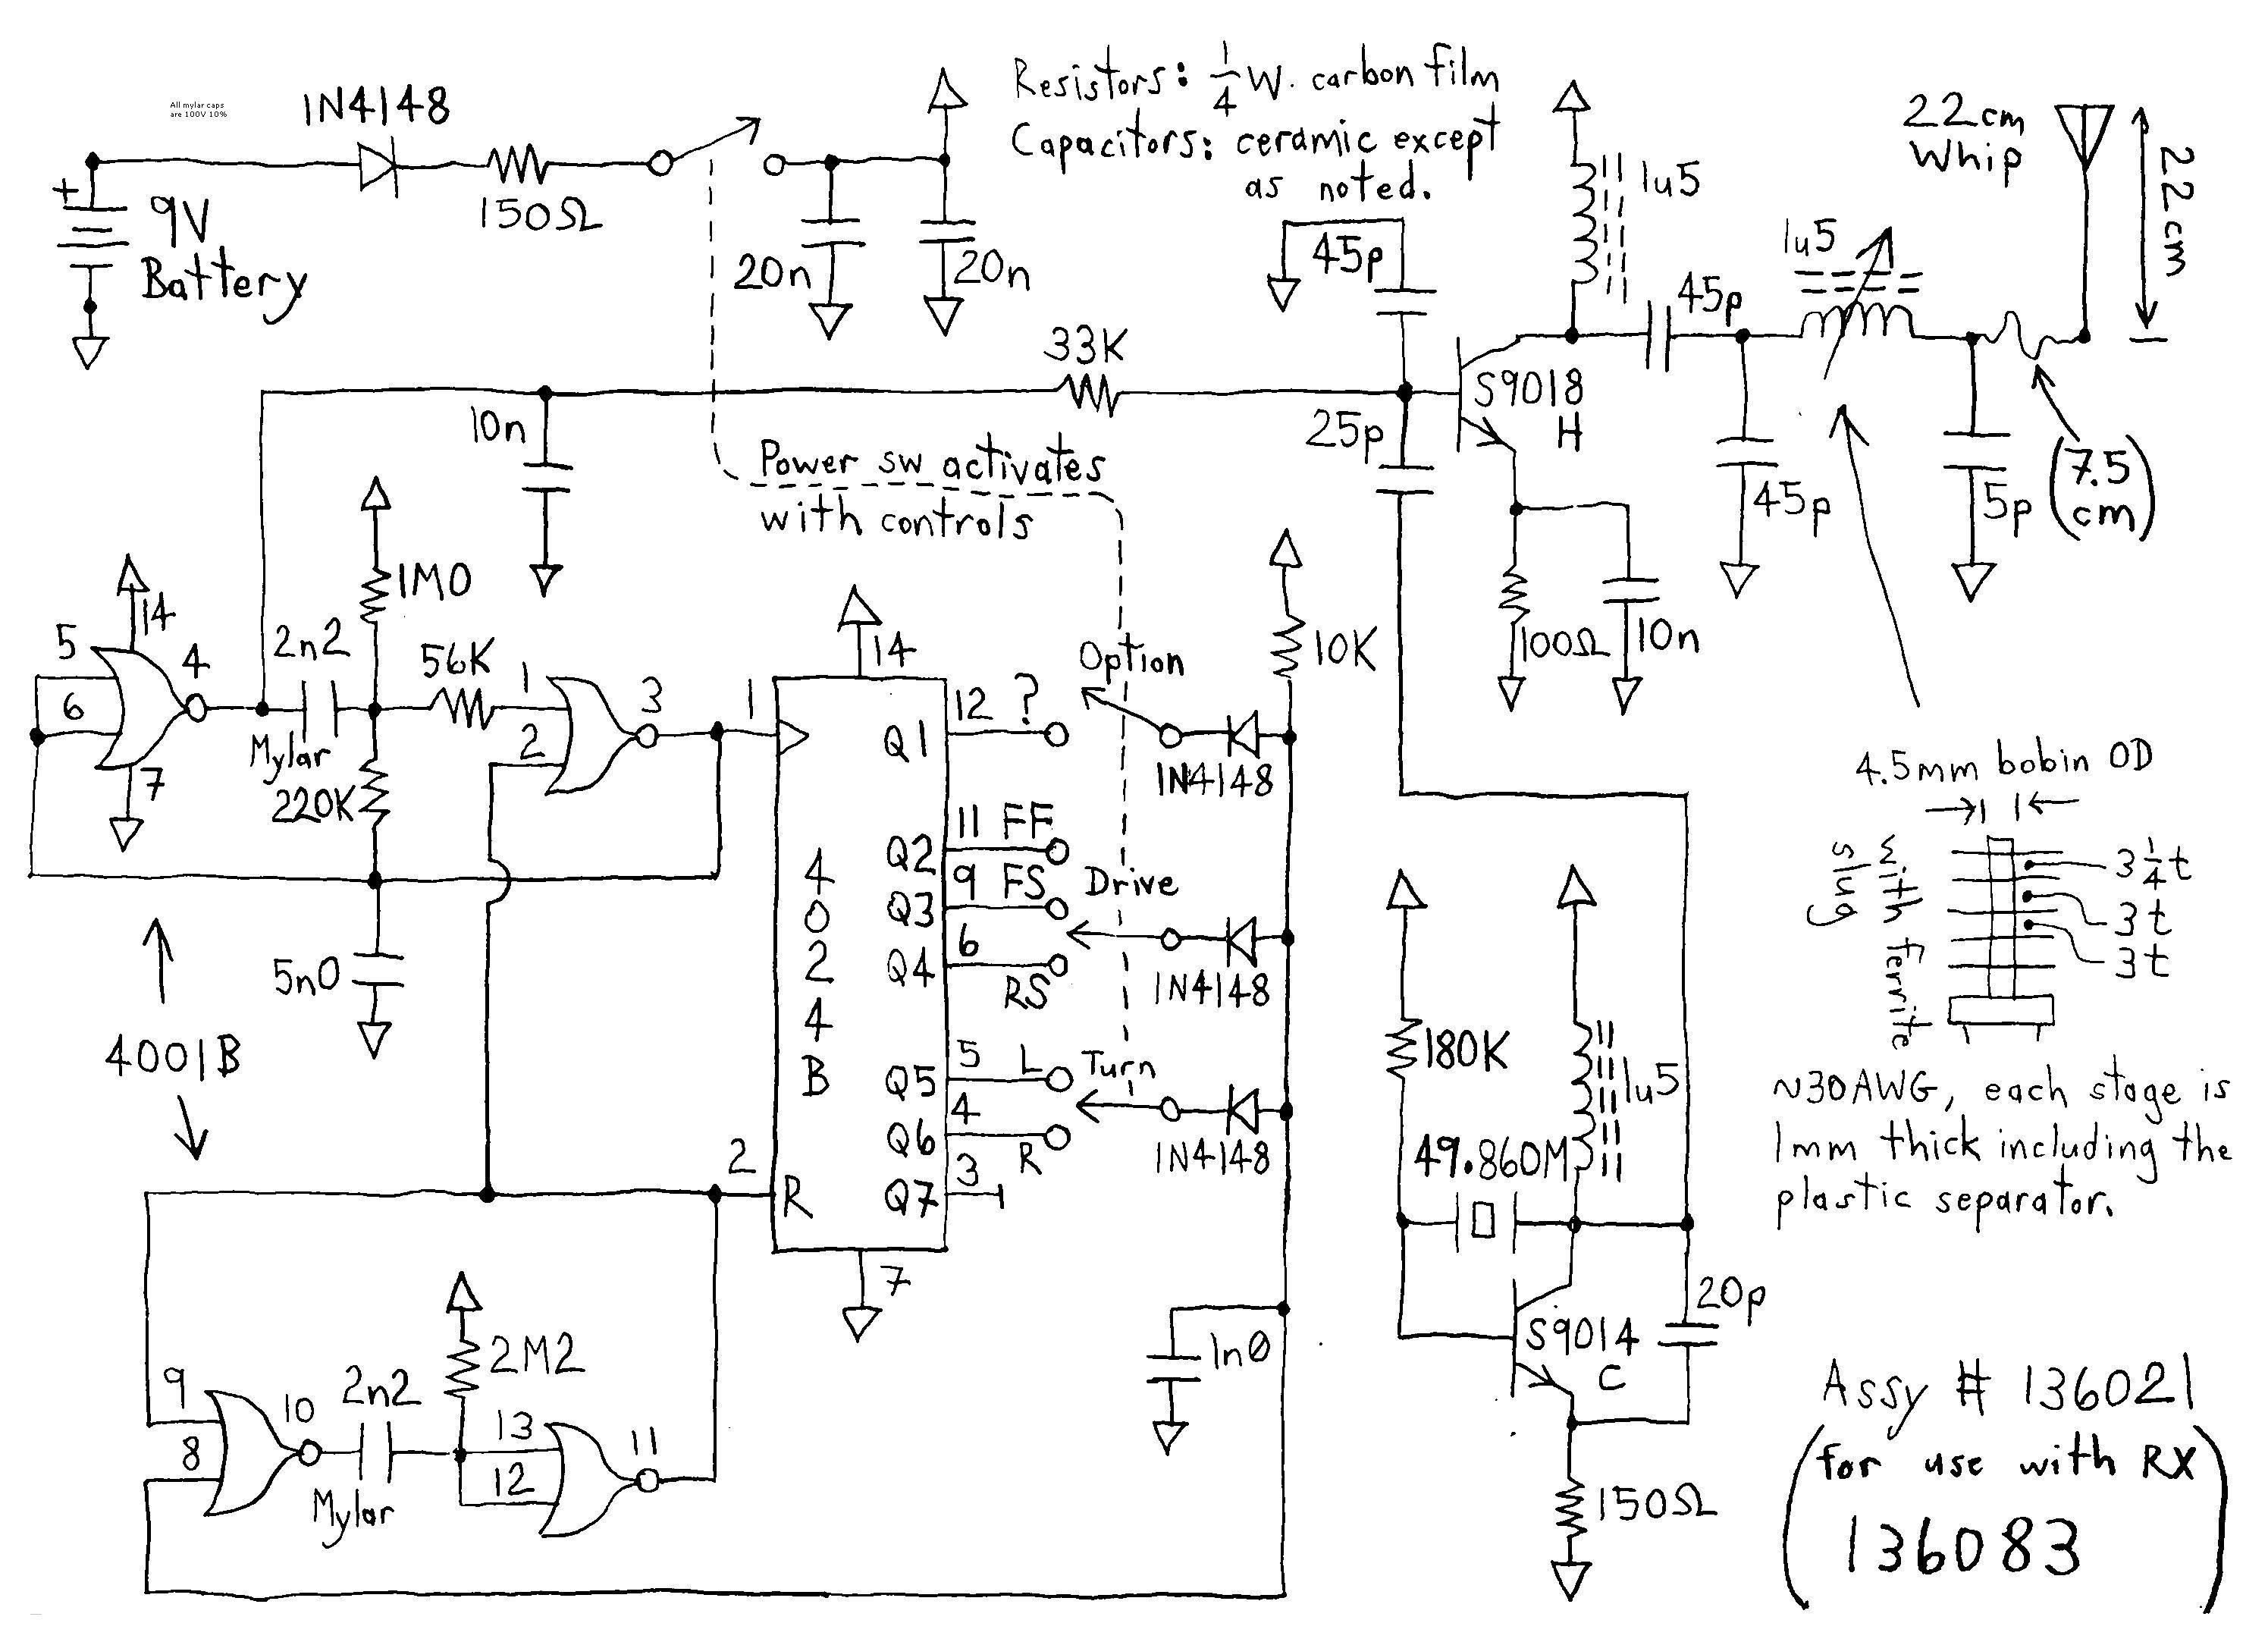 Elegant Wiring Diagram Nz Diagrams Digramssample Diagramimages Wiringdiagramsample Wiringdiagr Electrical Wiring Diagram Electrical Diagram Diagram Design